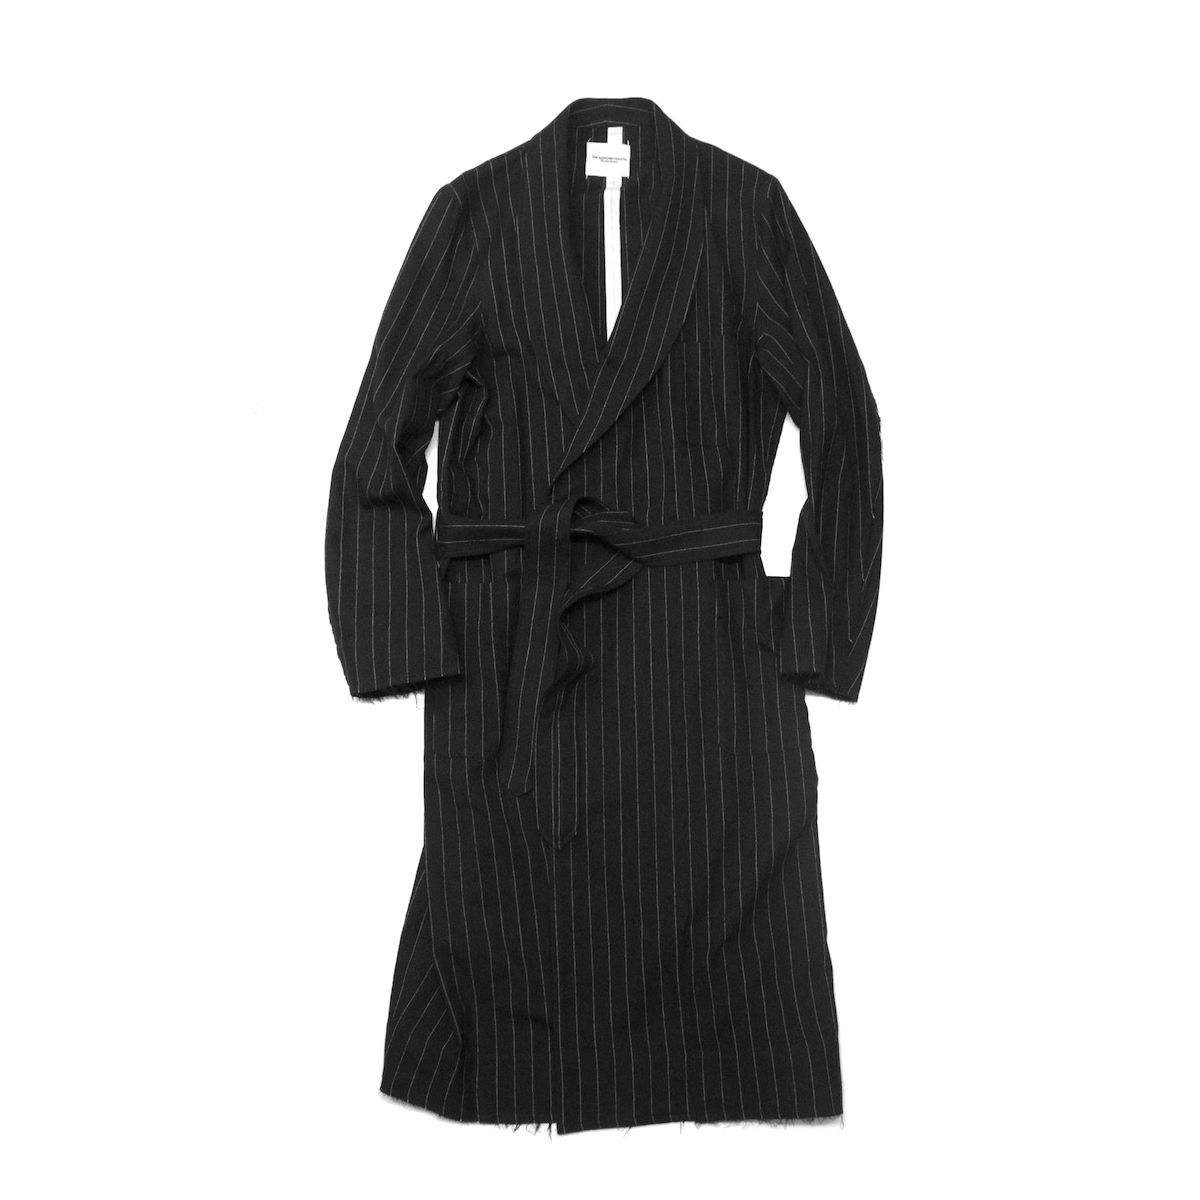 TheSoloist / swj.0018bAW18 robe pajama shirt. (black.×white.)